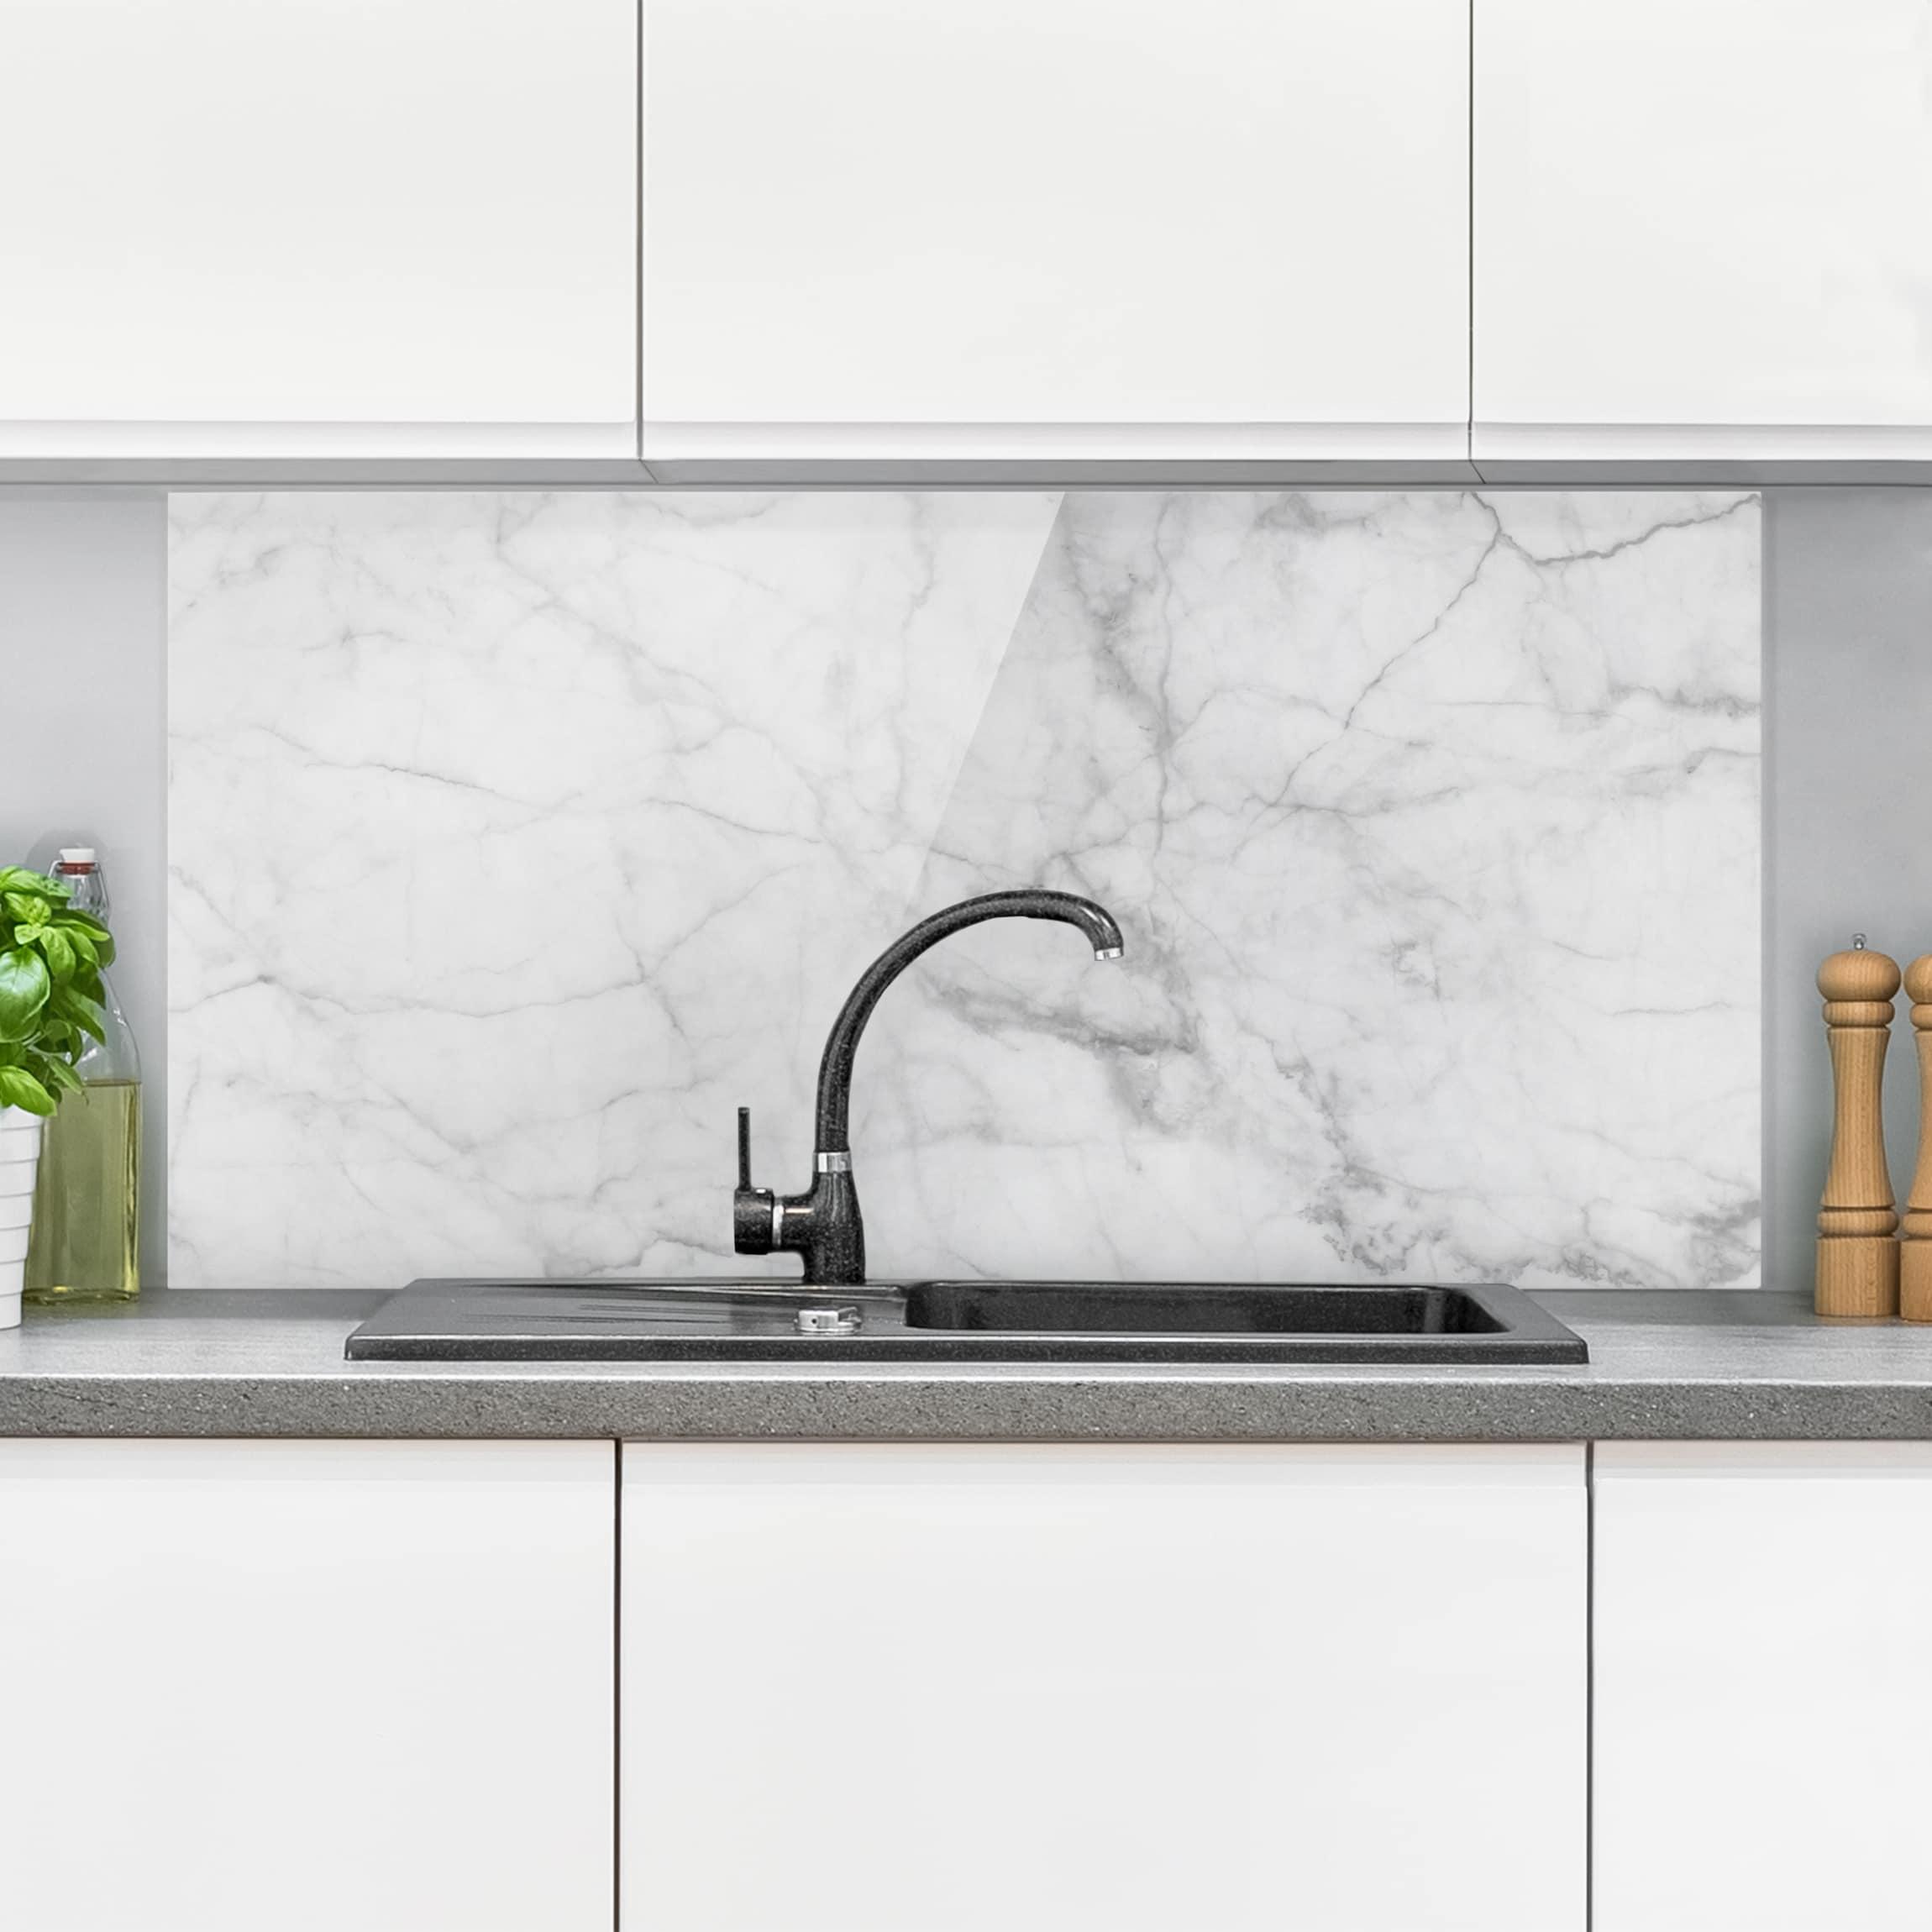 Komplett Kuchen Ausstattung Kuchenruckwand Spritzschutz Kuche Gehartetes Glas Marmor Textur Grau Kabtel Mk